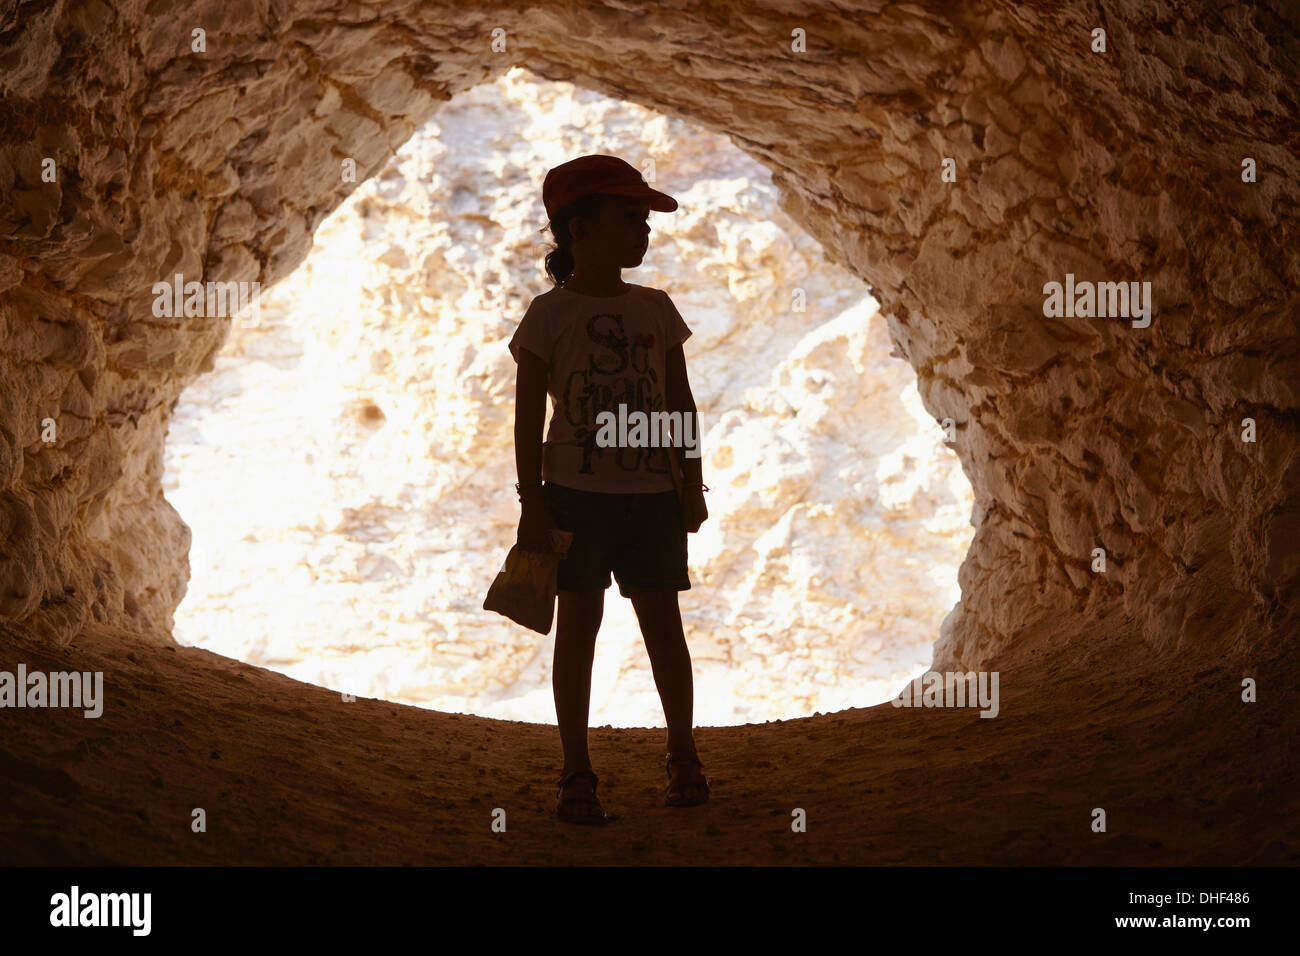 Girl standing in entrance of cave, Cabo de Gata, Almeria, Spain - Stock Image